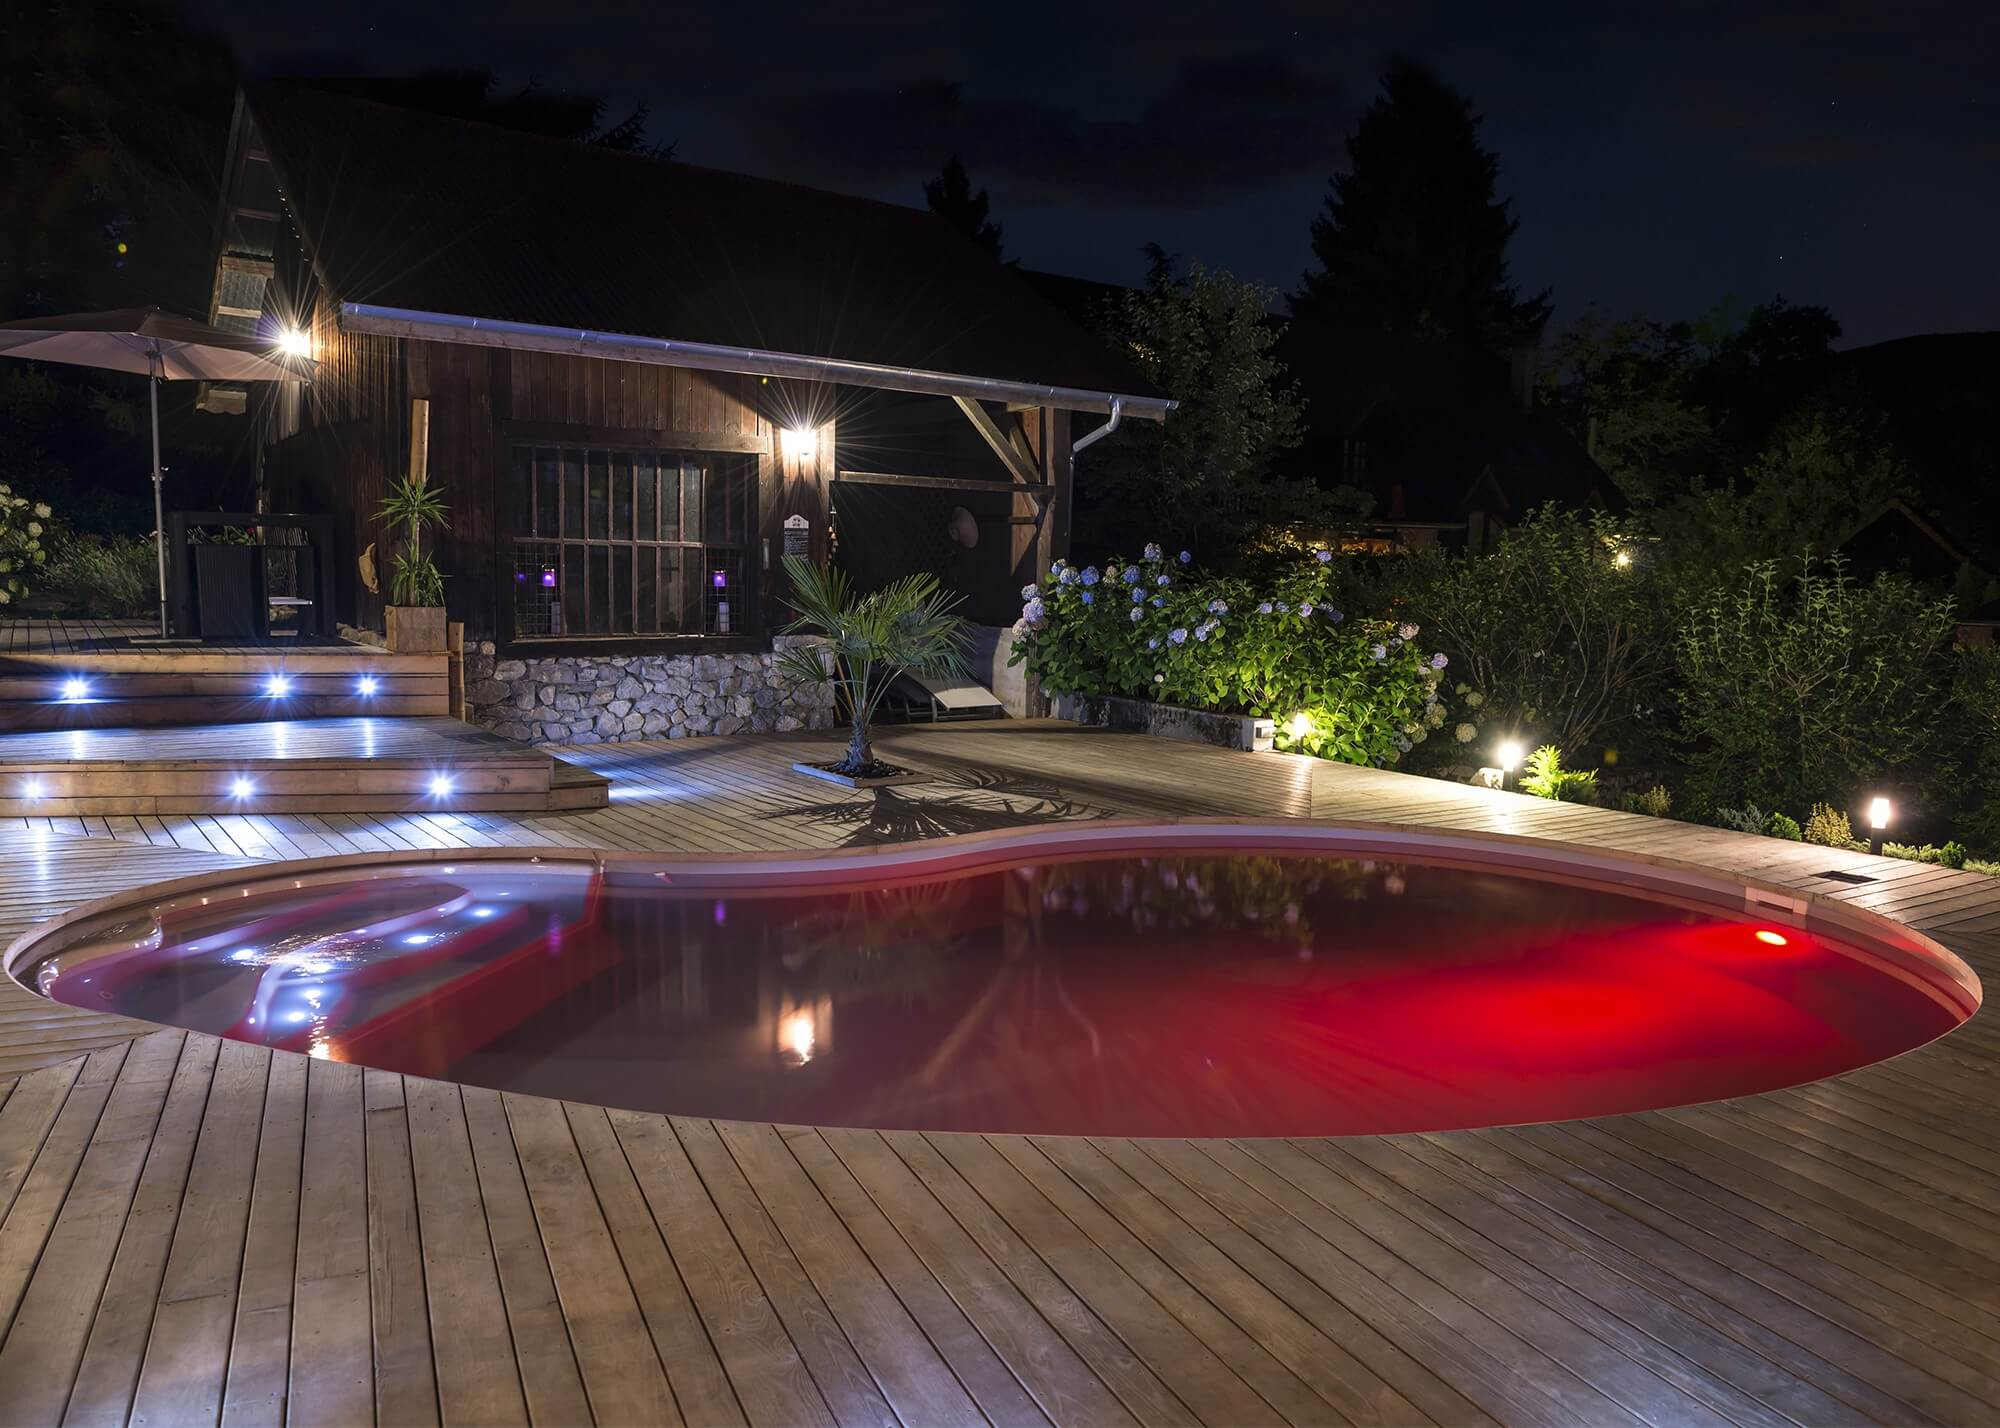 projecteur led waterair